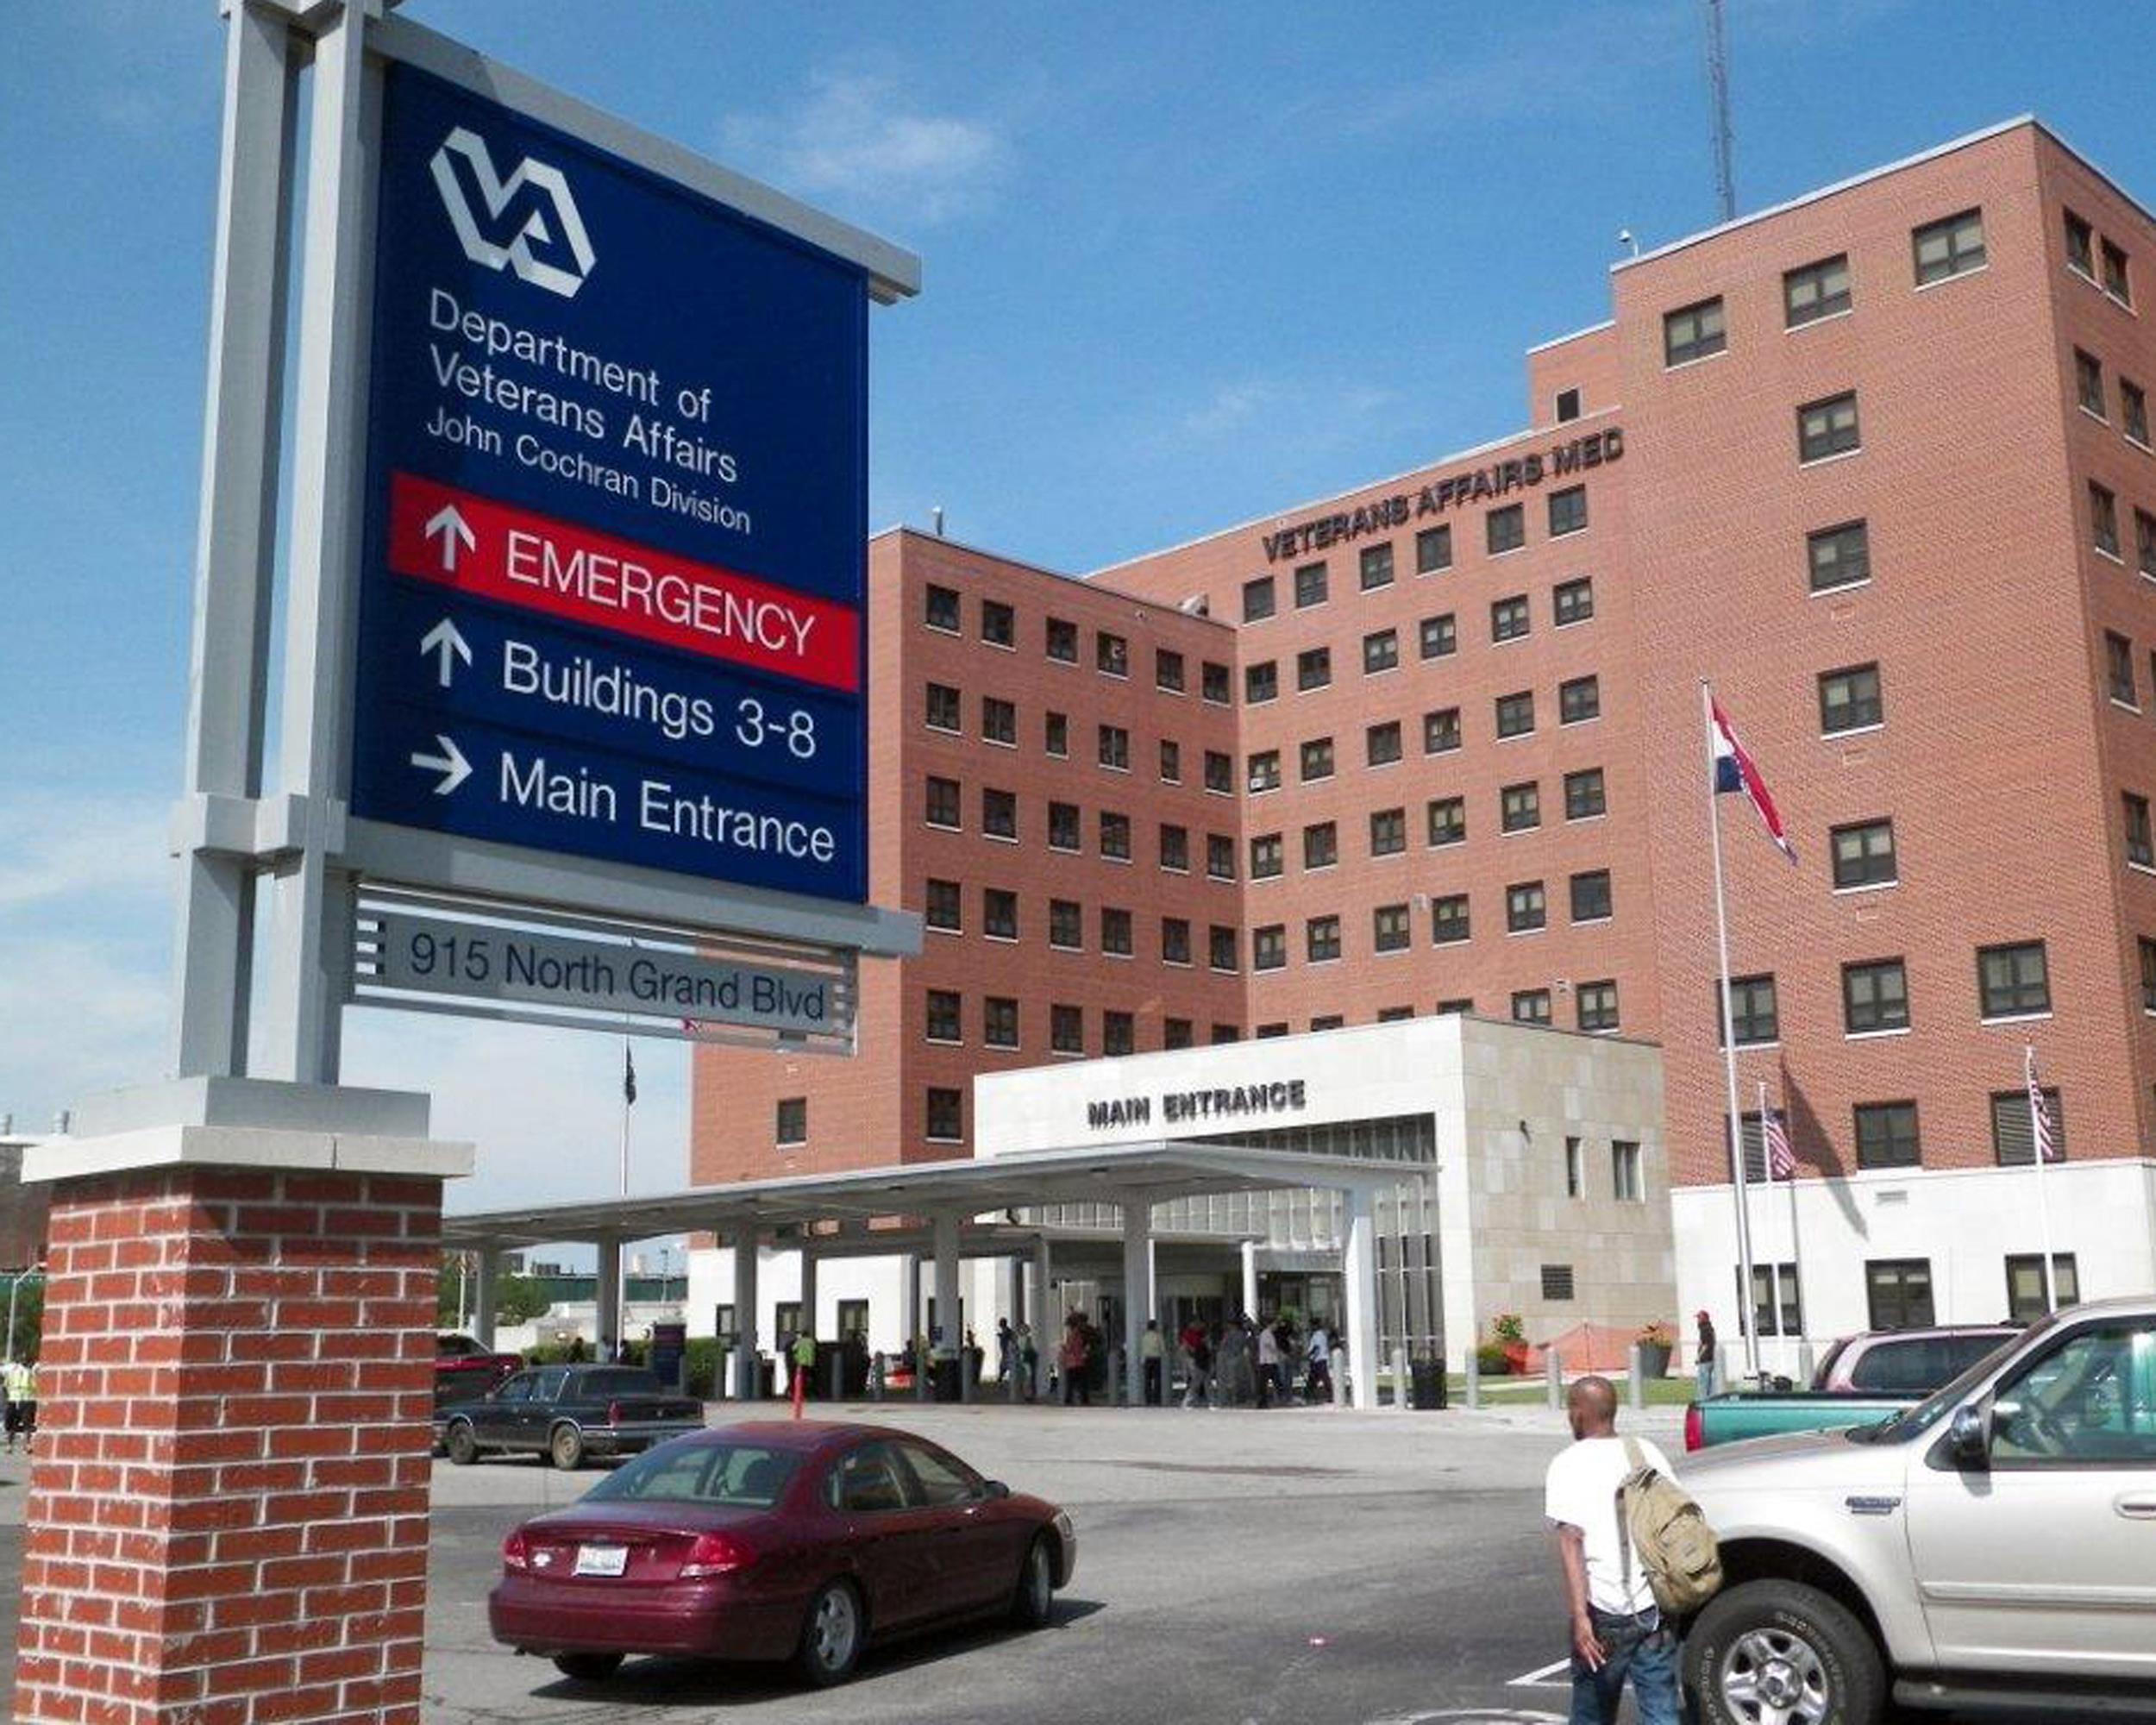 Image:The St. Louis VA Medical Center